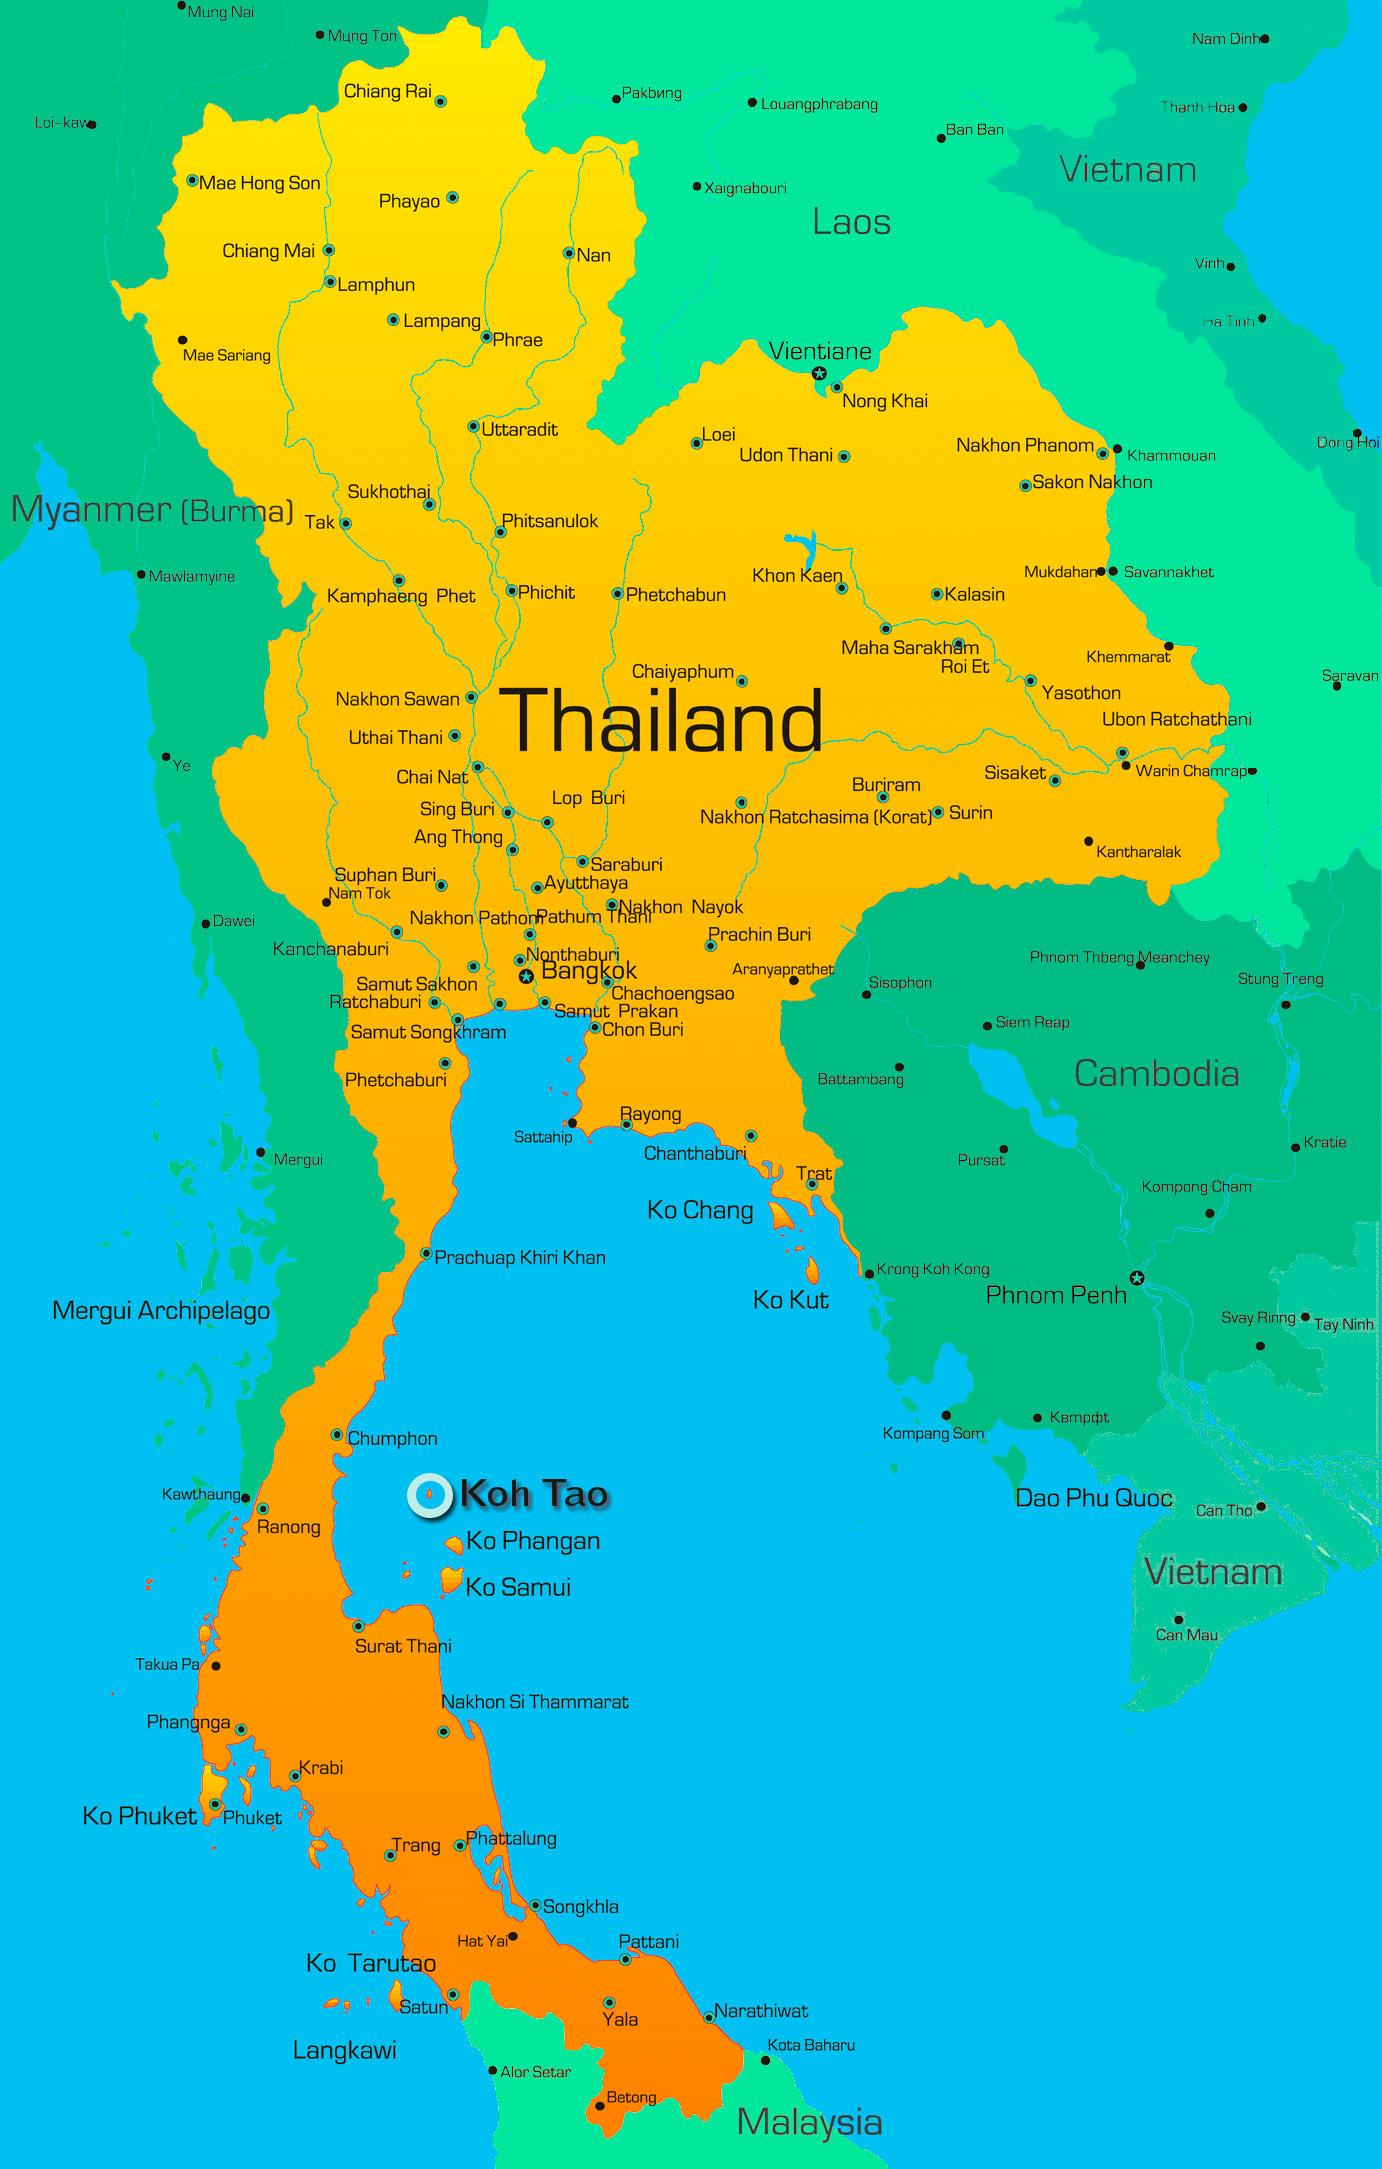 Carte Complete Thailande.Pourquoi Choisir D Aller En Thailande Ecrivaindumonde